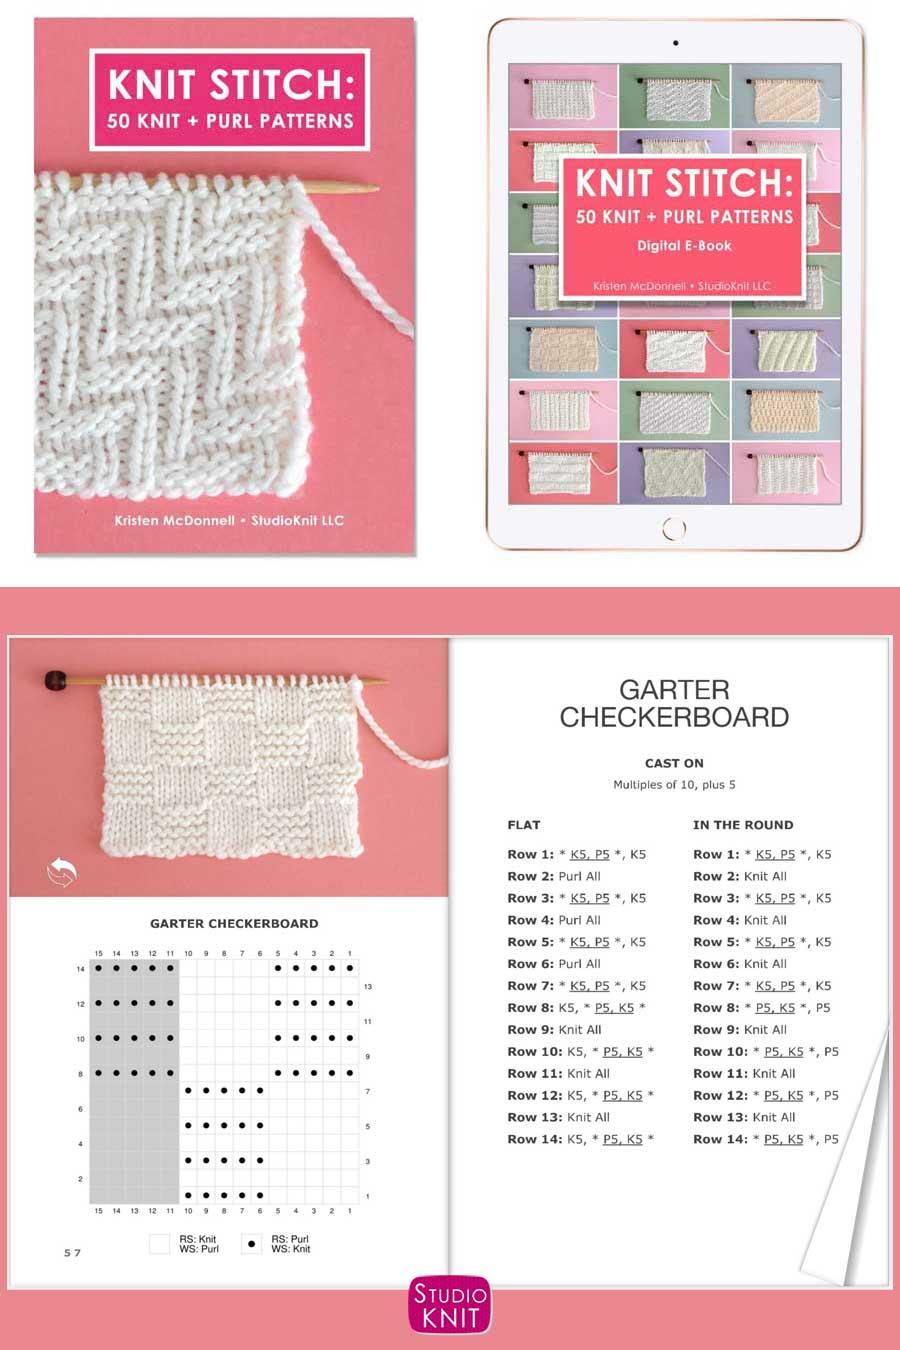 Knit Stitch Pattern Book instructions and knitting chart of Garter Checkerboard Stitch